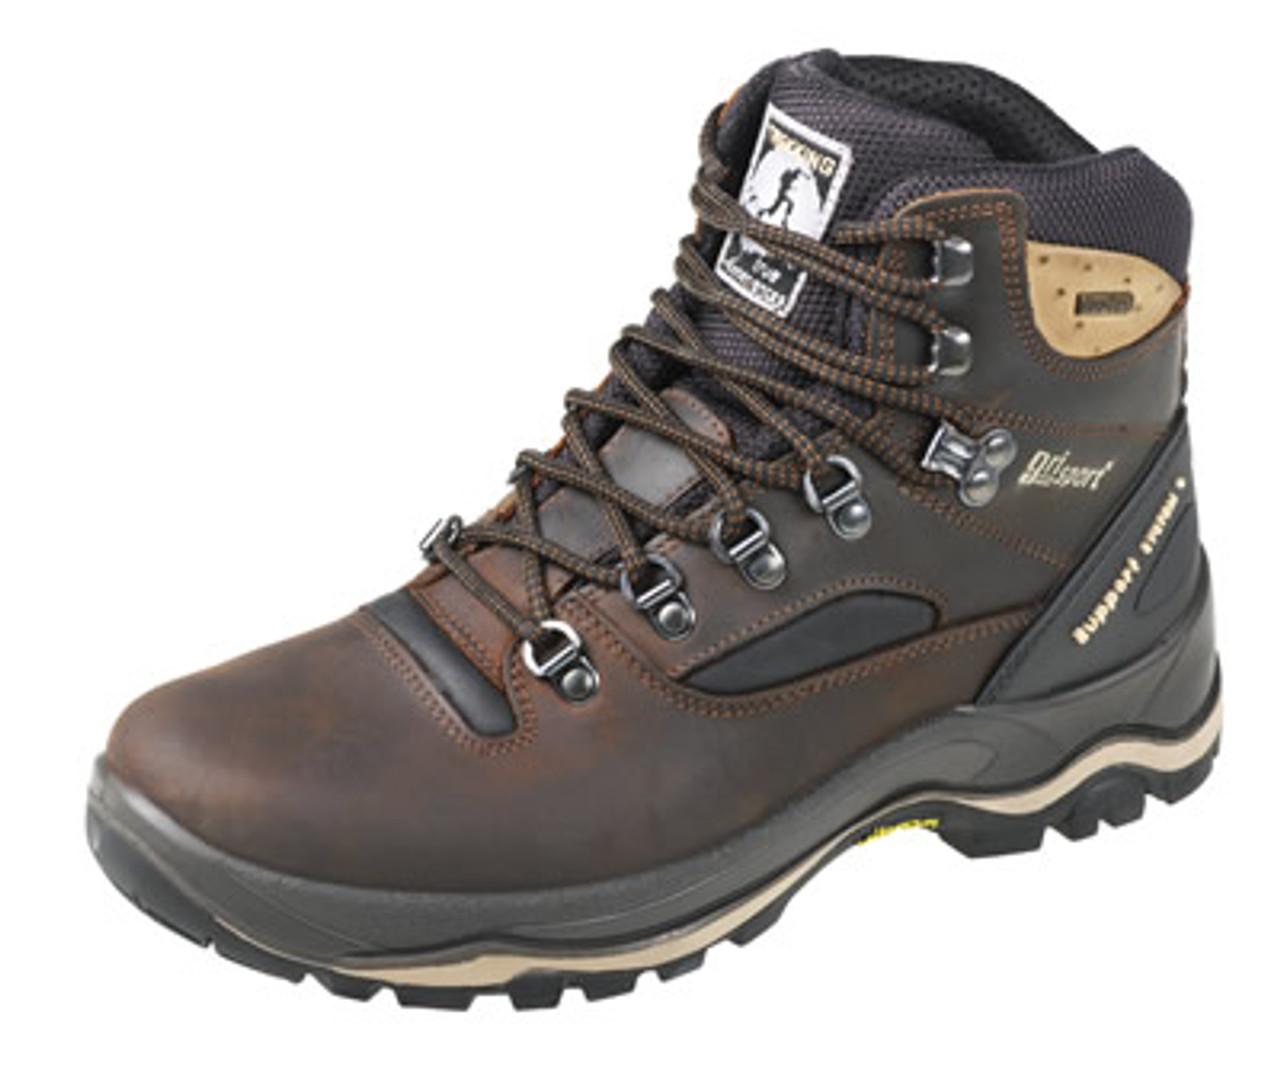 Grisport Unisex Mens Womens Forest Light Lowland Walking Hiking Trekking Boots